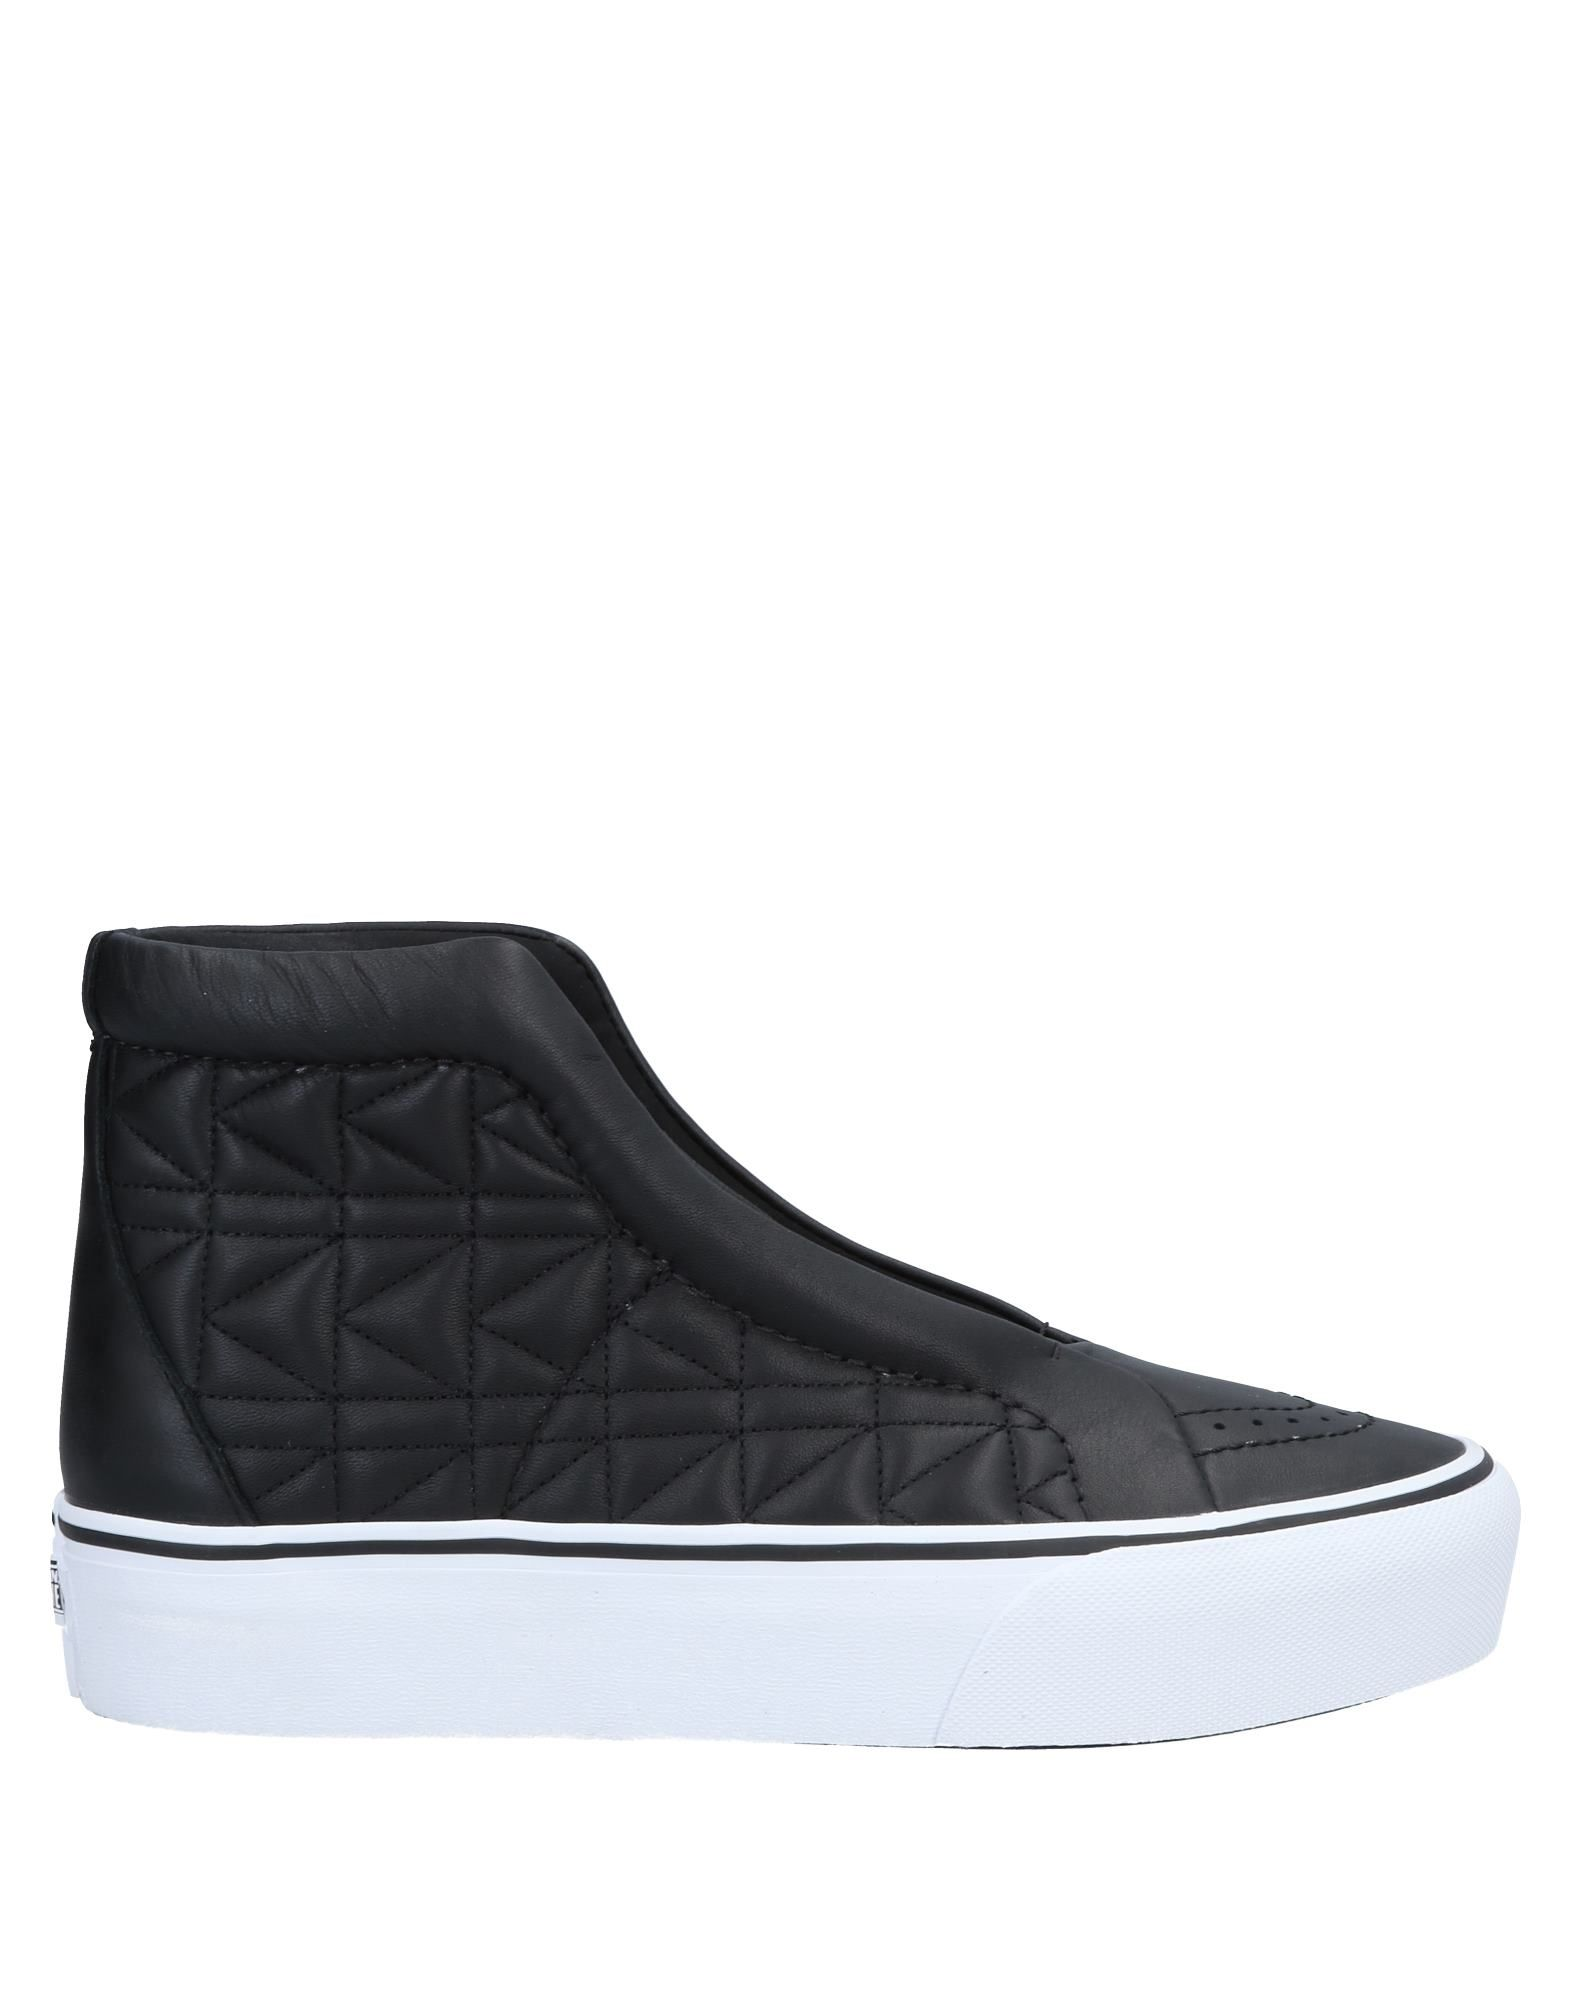 Vans X Karl Lagerfeld Sneakers Damen  11551627HN Gute Qualität beliebte Schuhe